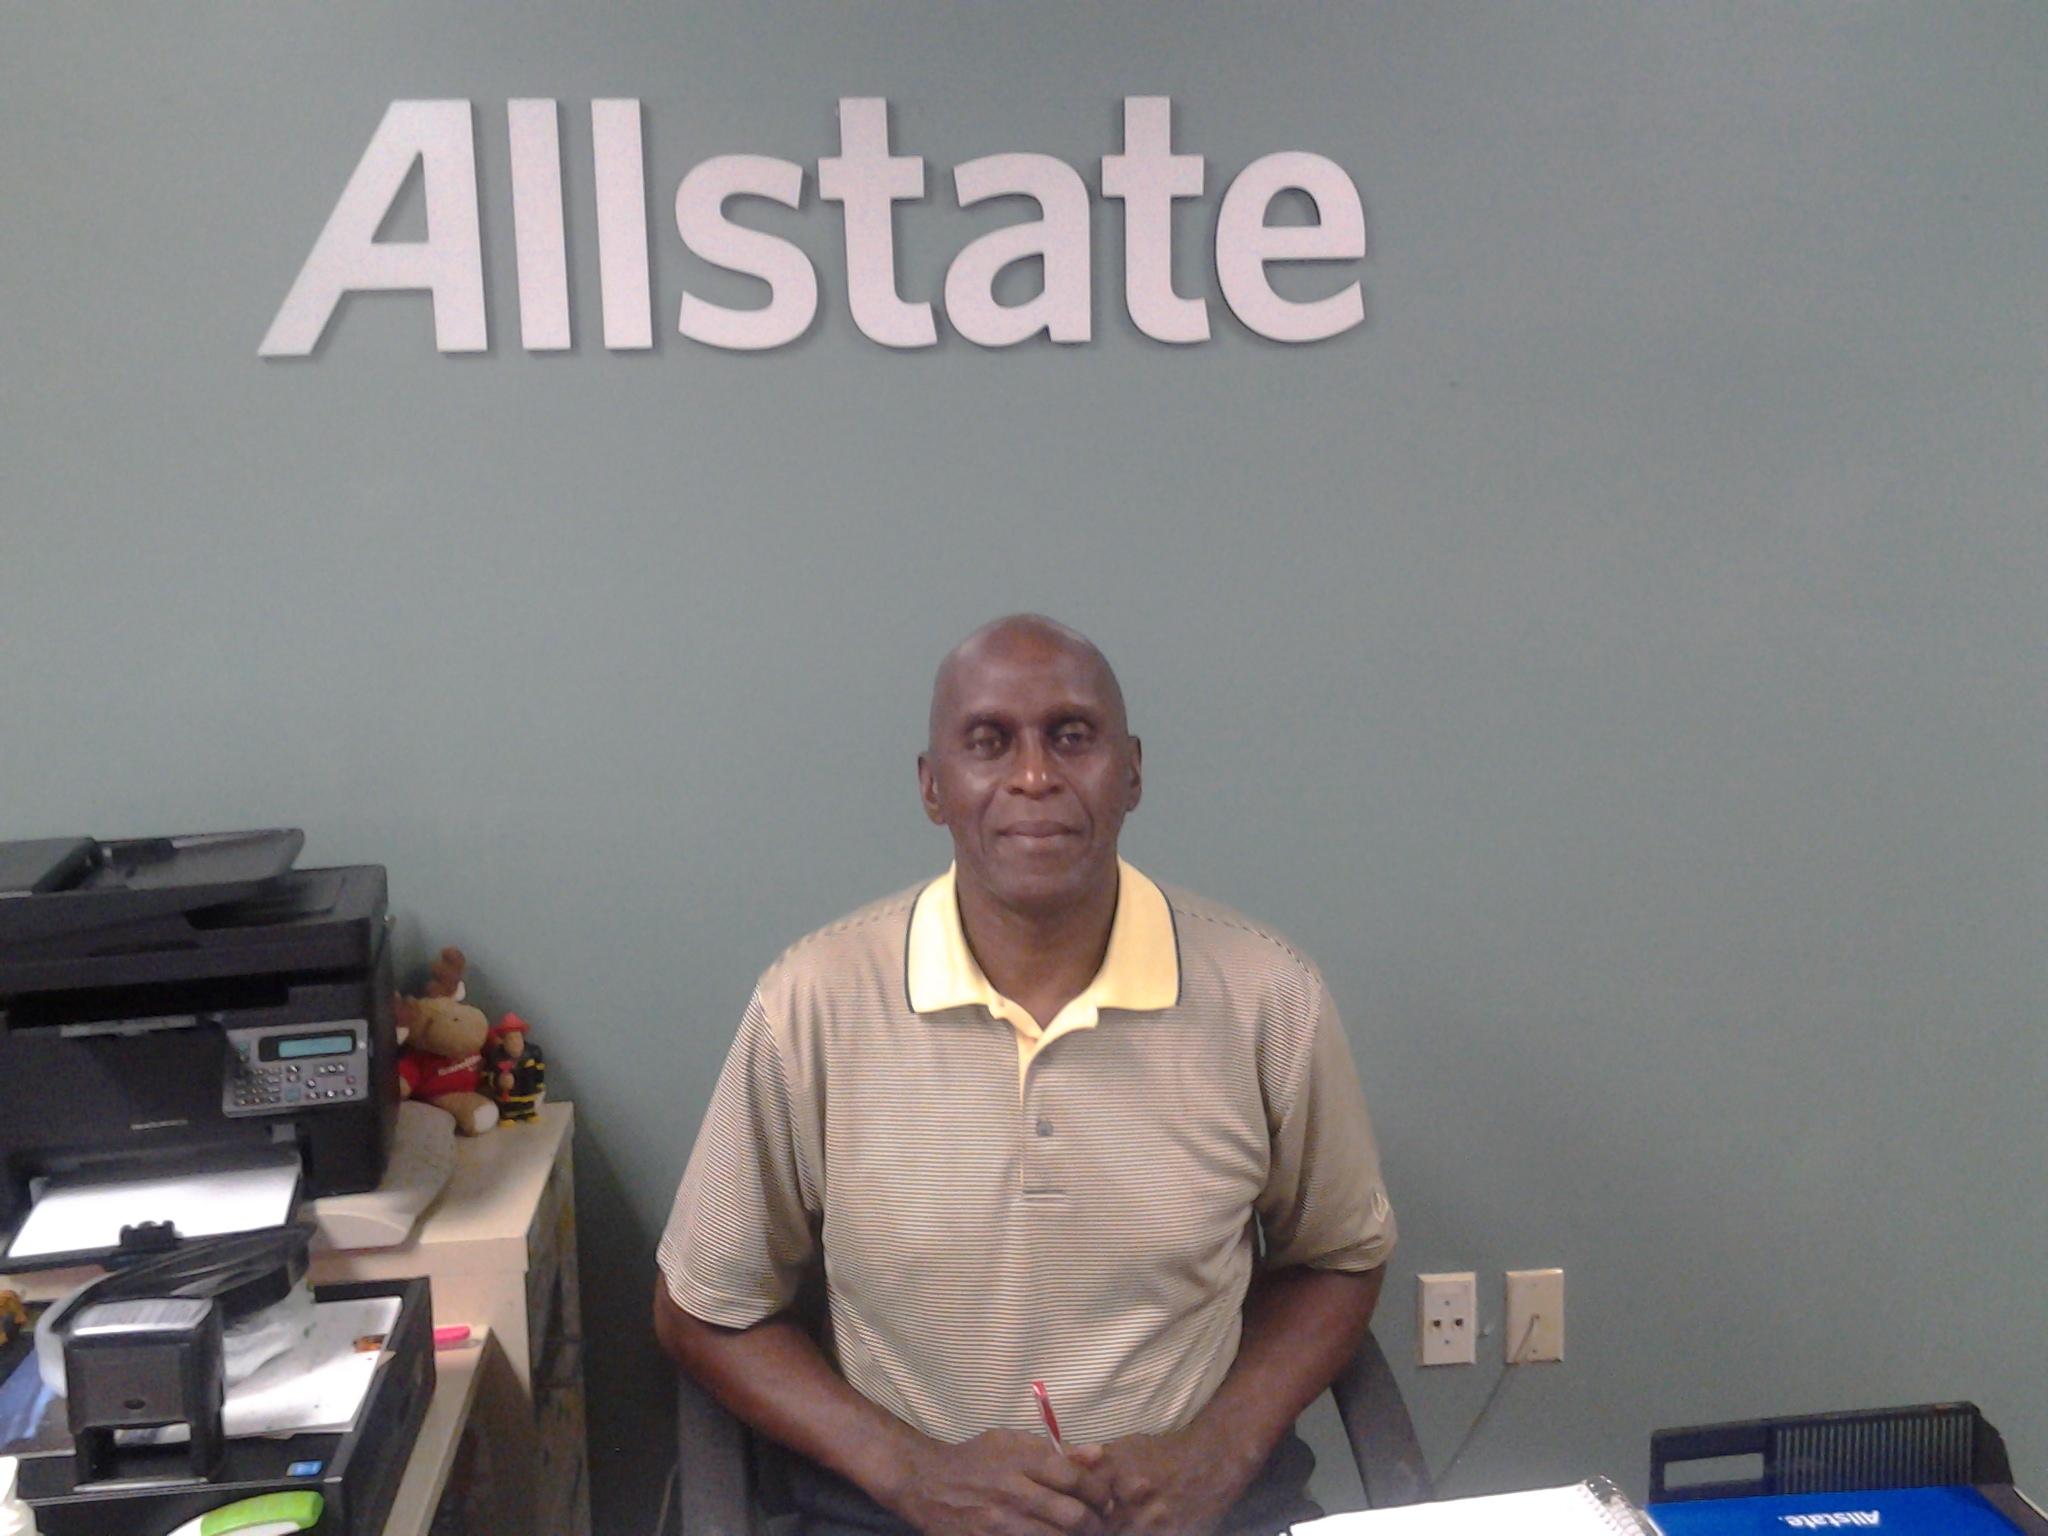 Allstate Insurance: Harry Blake - Summerville, SC 29485 - (843) 873-8970 | ShowMeLocal.com